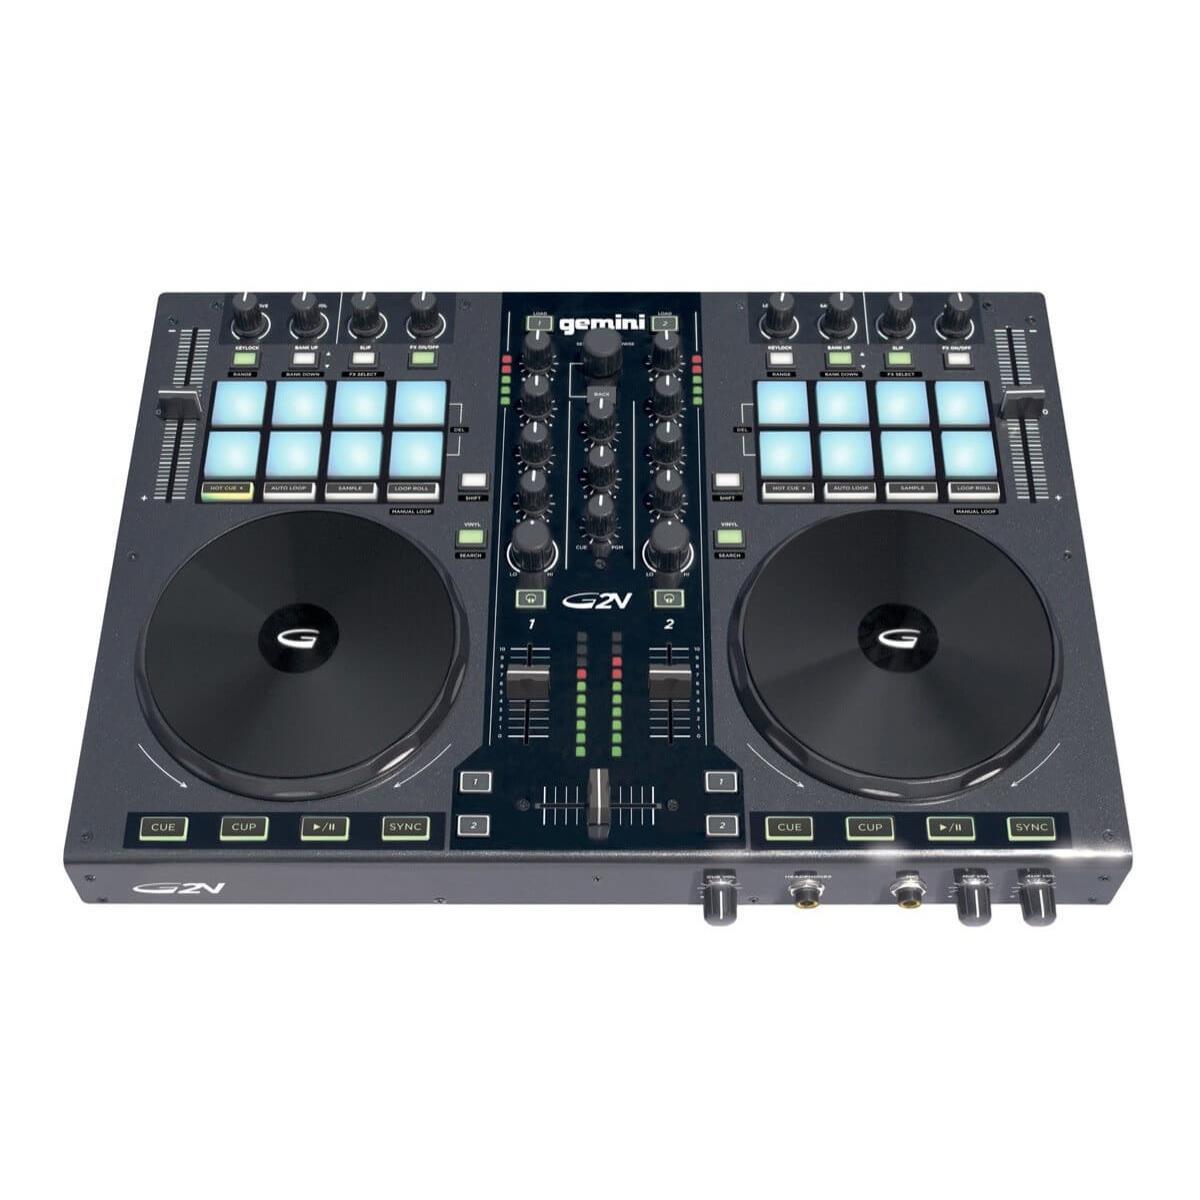 GEMINI G2V CONTROLLER DJ